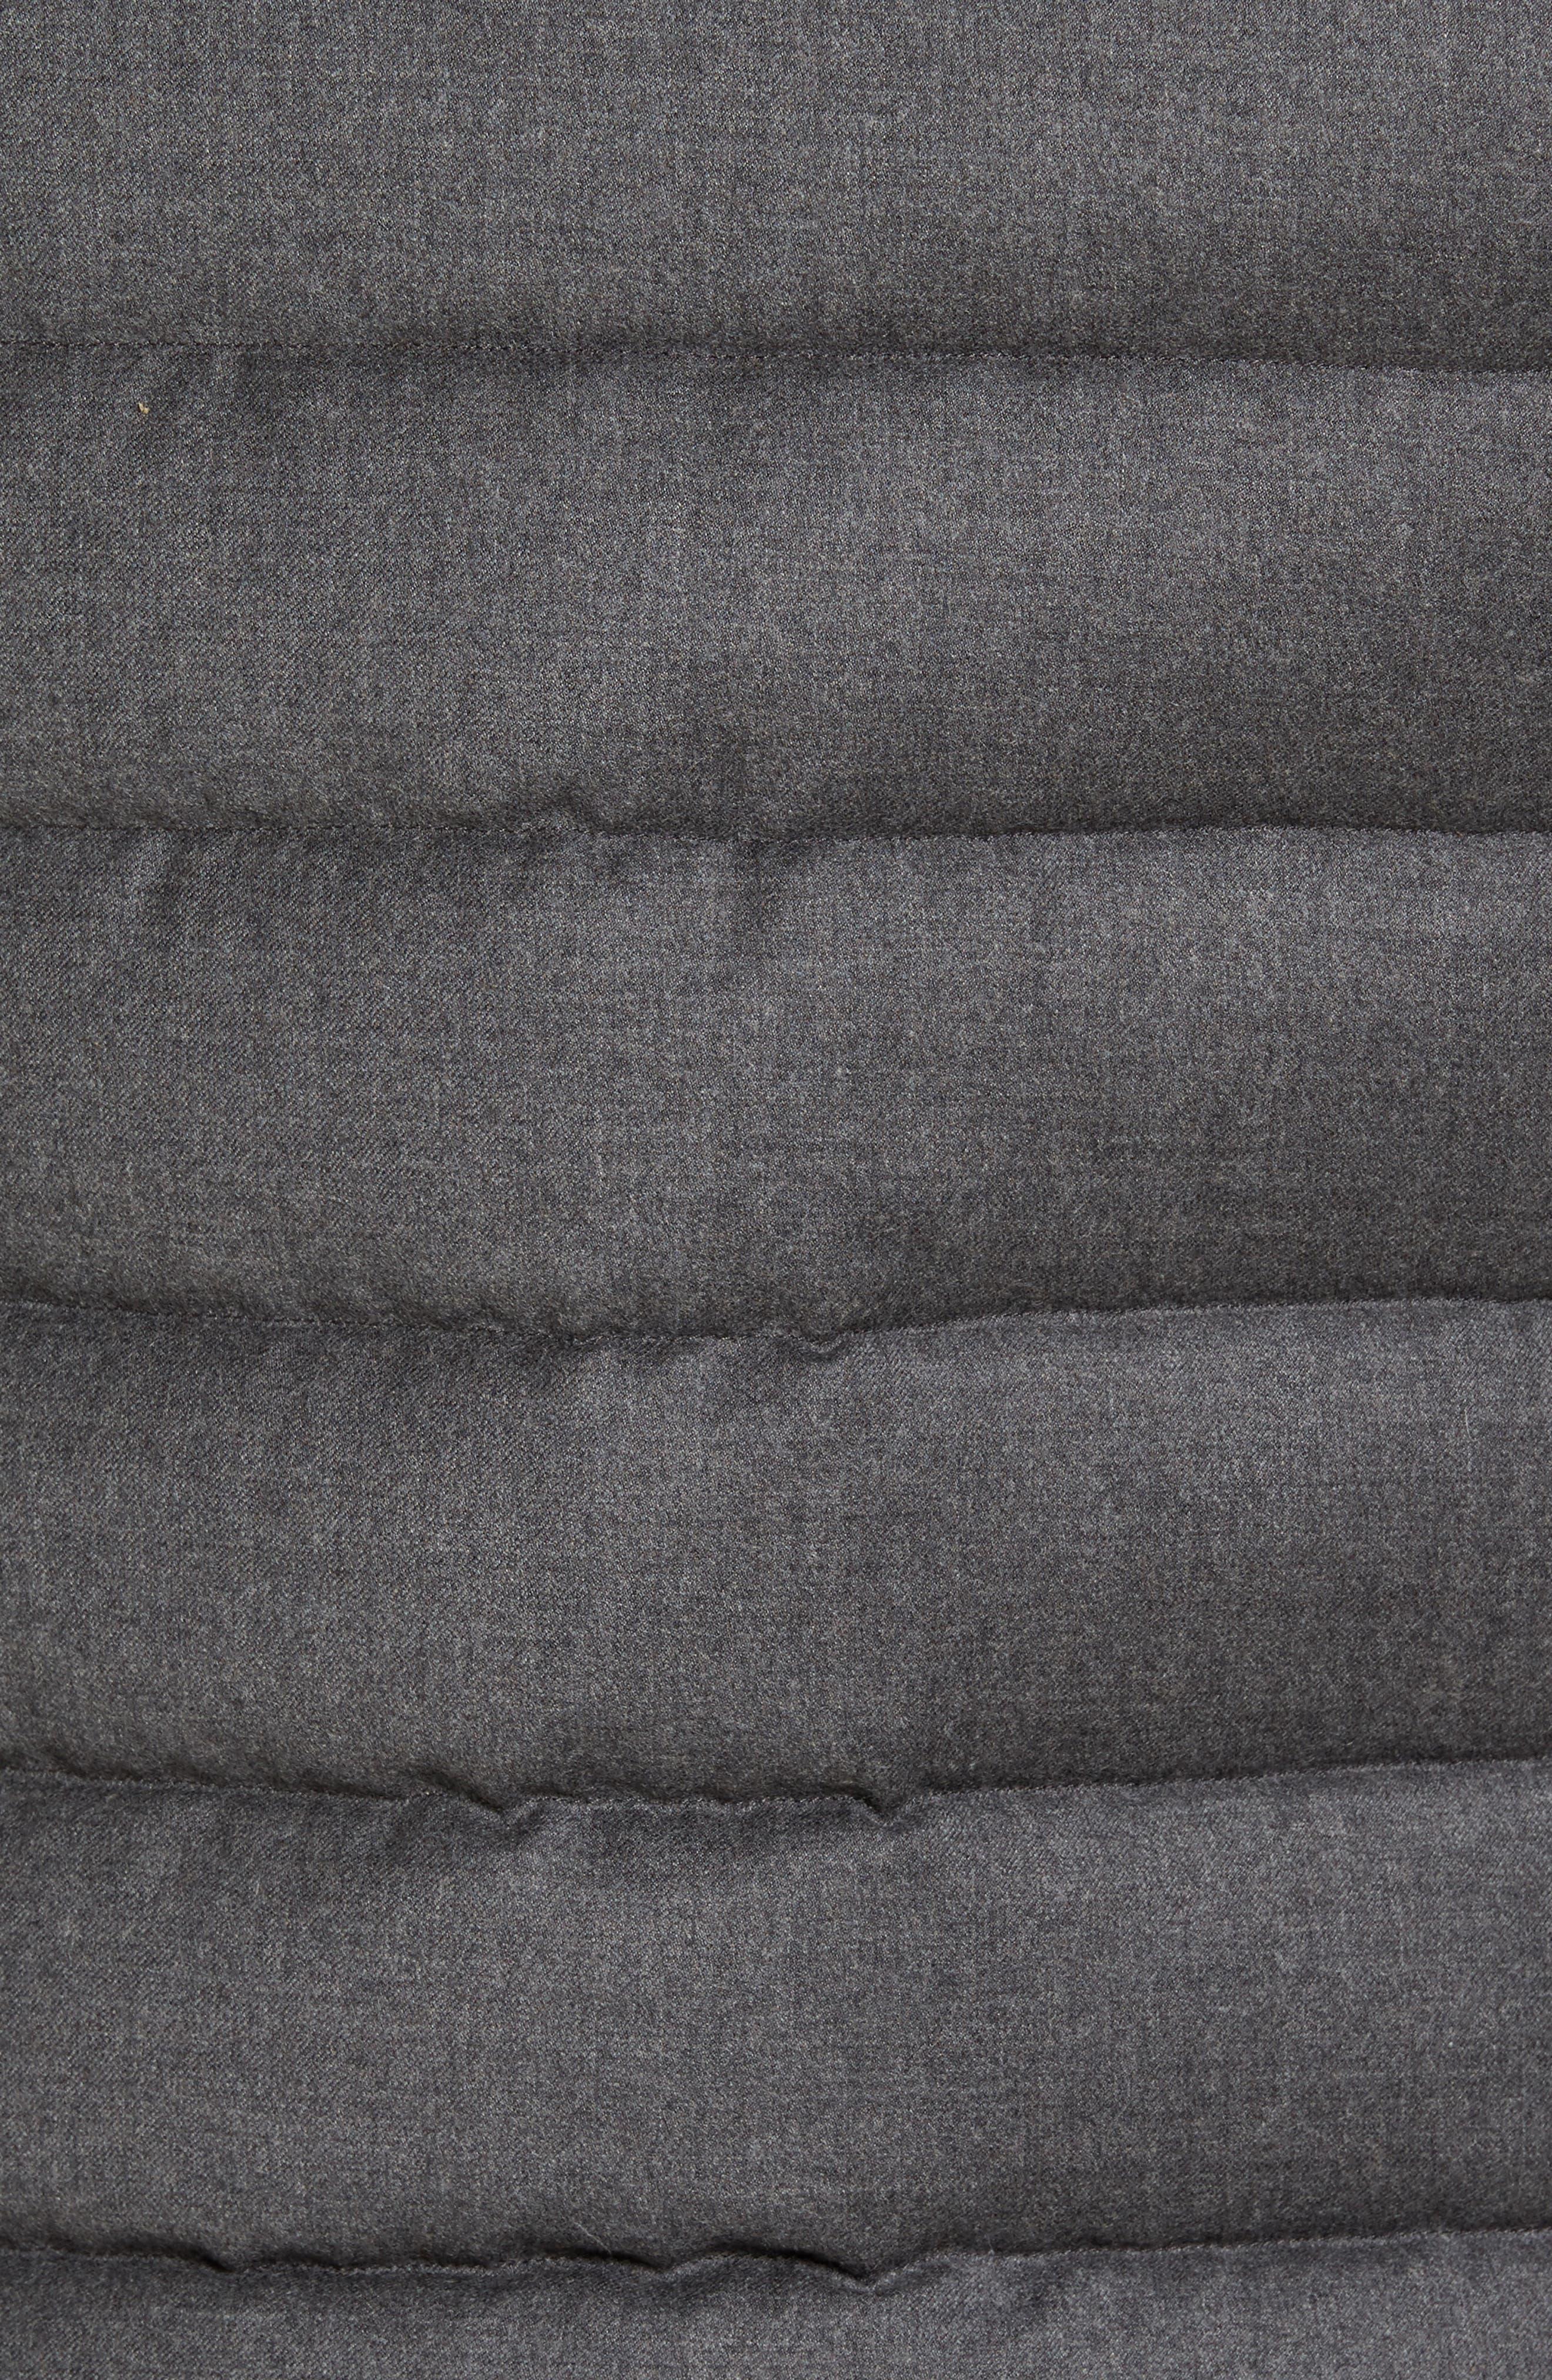 Oliver L Wool & Cashmere Flannel Waterproof Vest,                             Alternate thumbnail 6, color,                             030